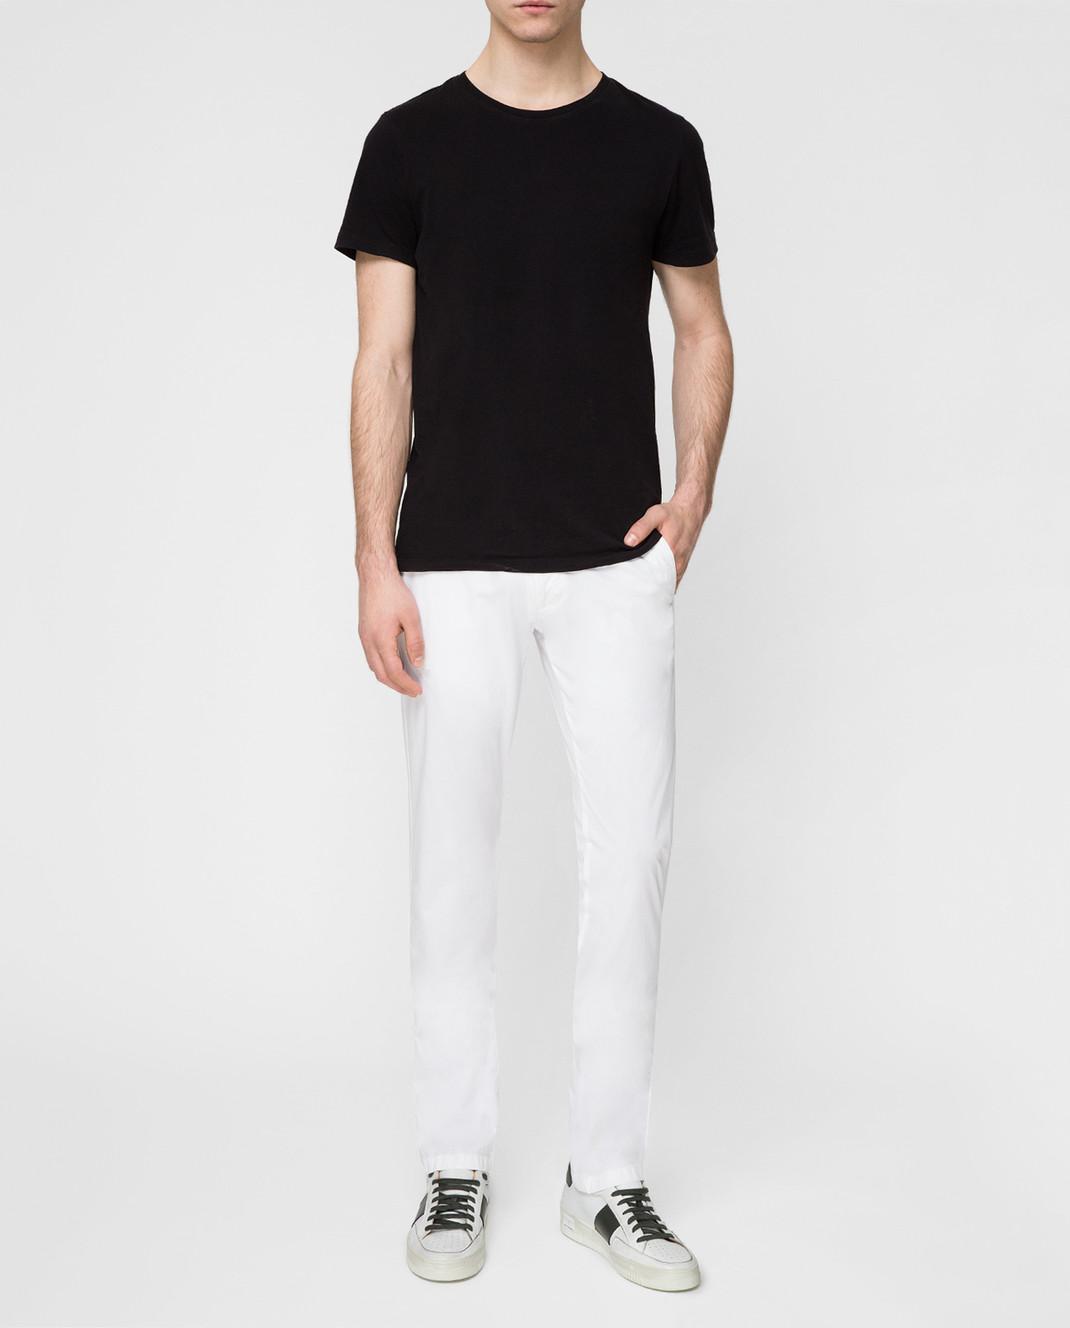 Kiton Белые брюки UPCAPRJ07R90 изображение 2